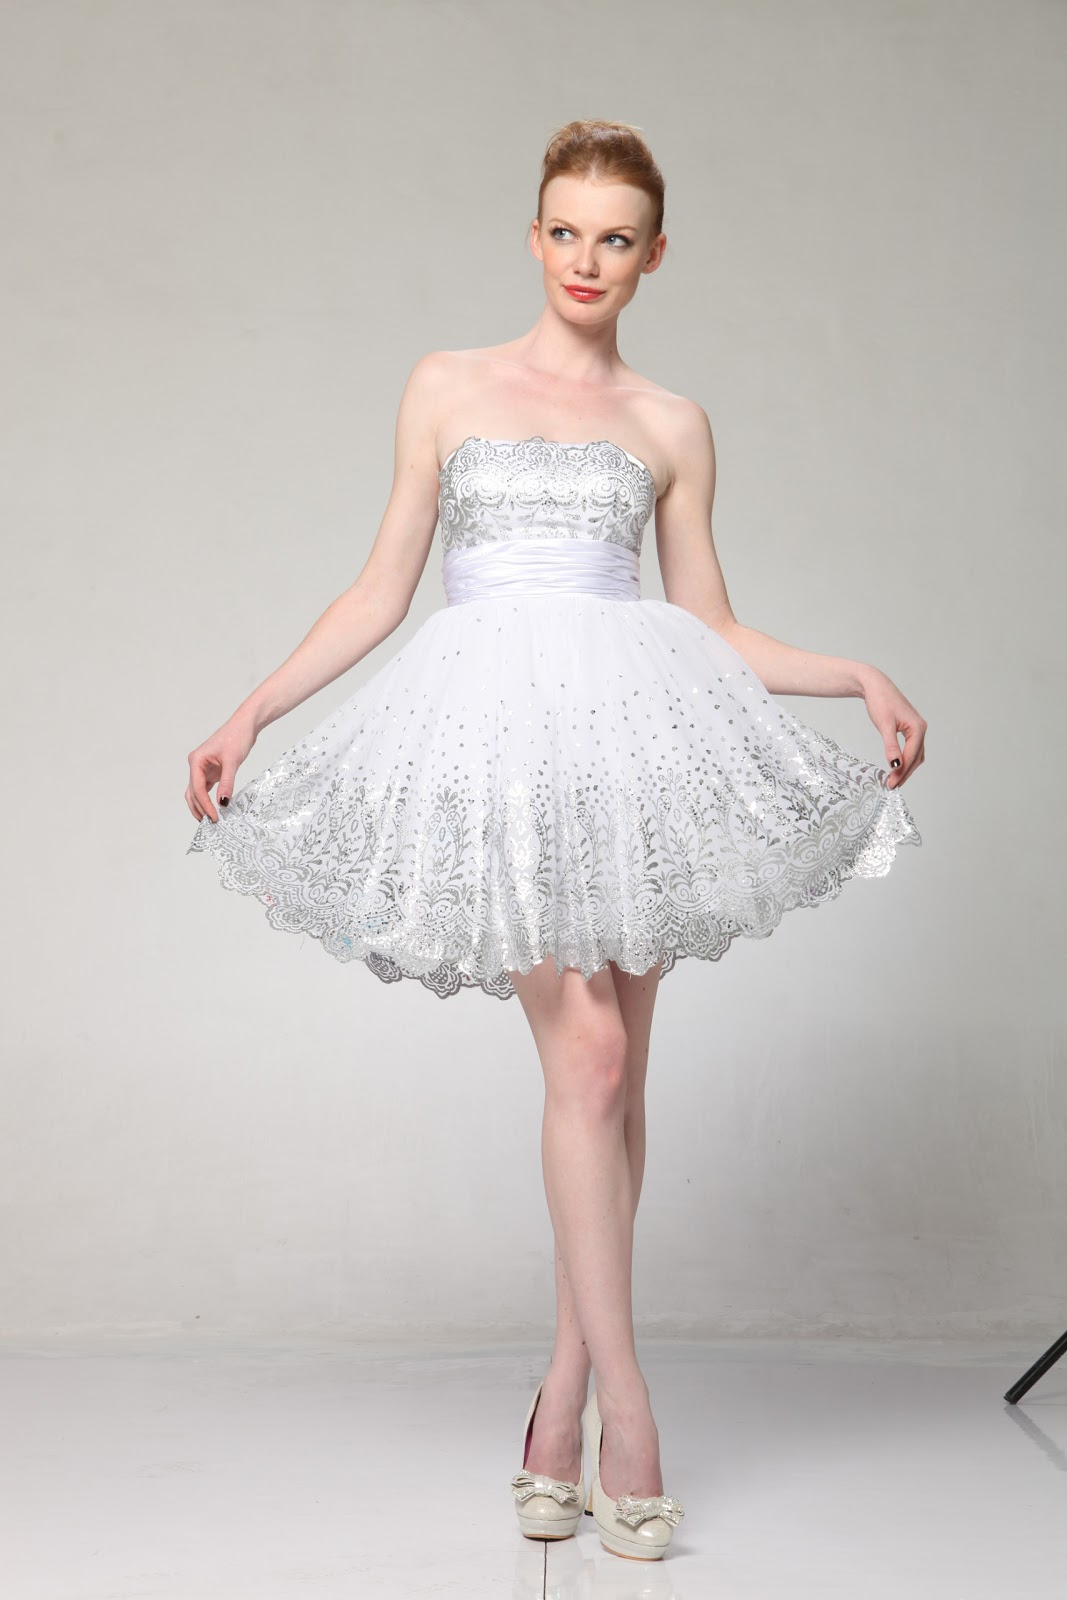 Deceivingly domestic wedding wednesday short wedding dress for Short wedding dresses images